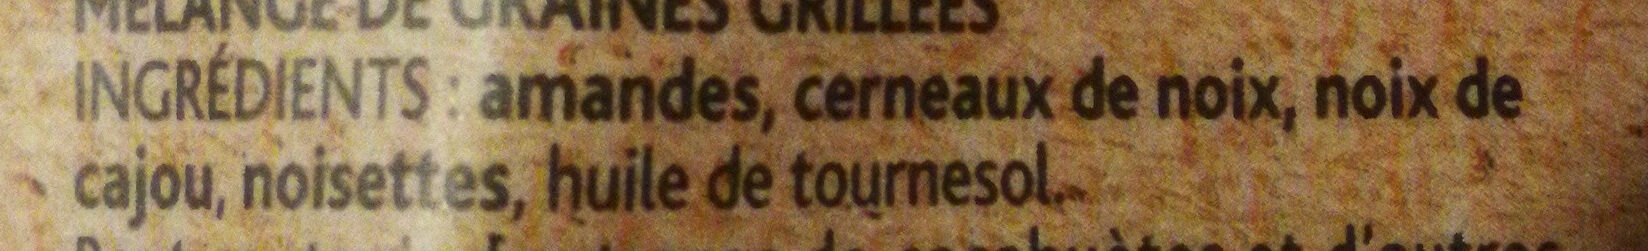 Plaisir brut non salé Mélange de noix - Ingrediënten - fr